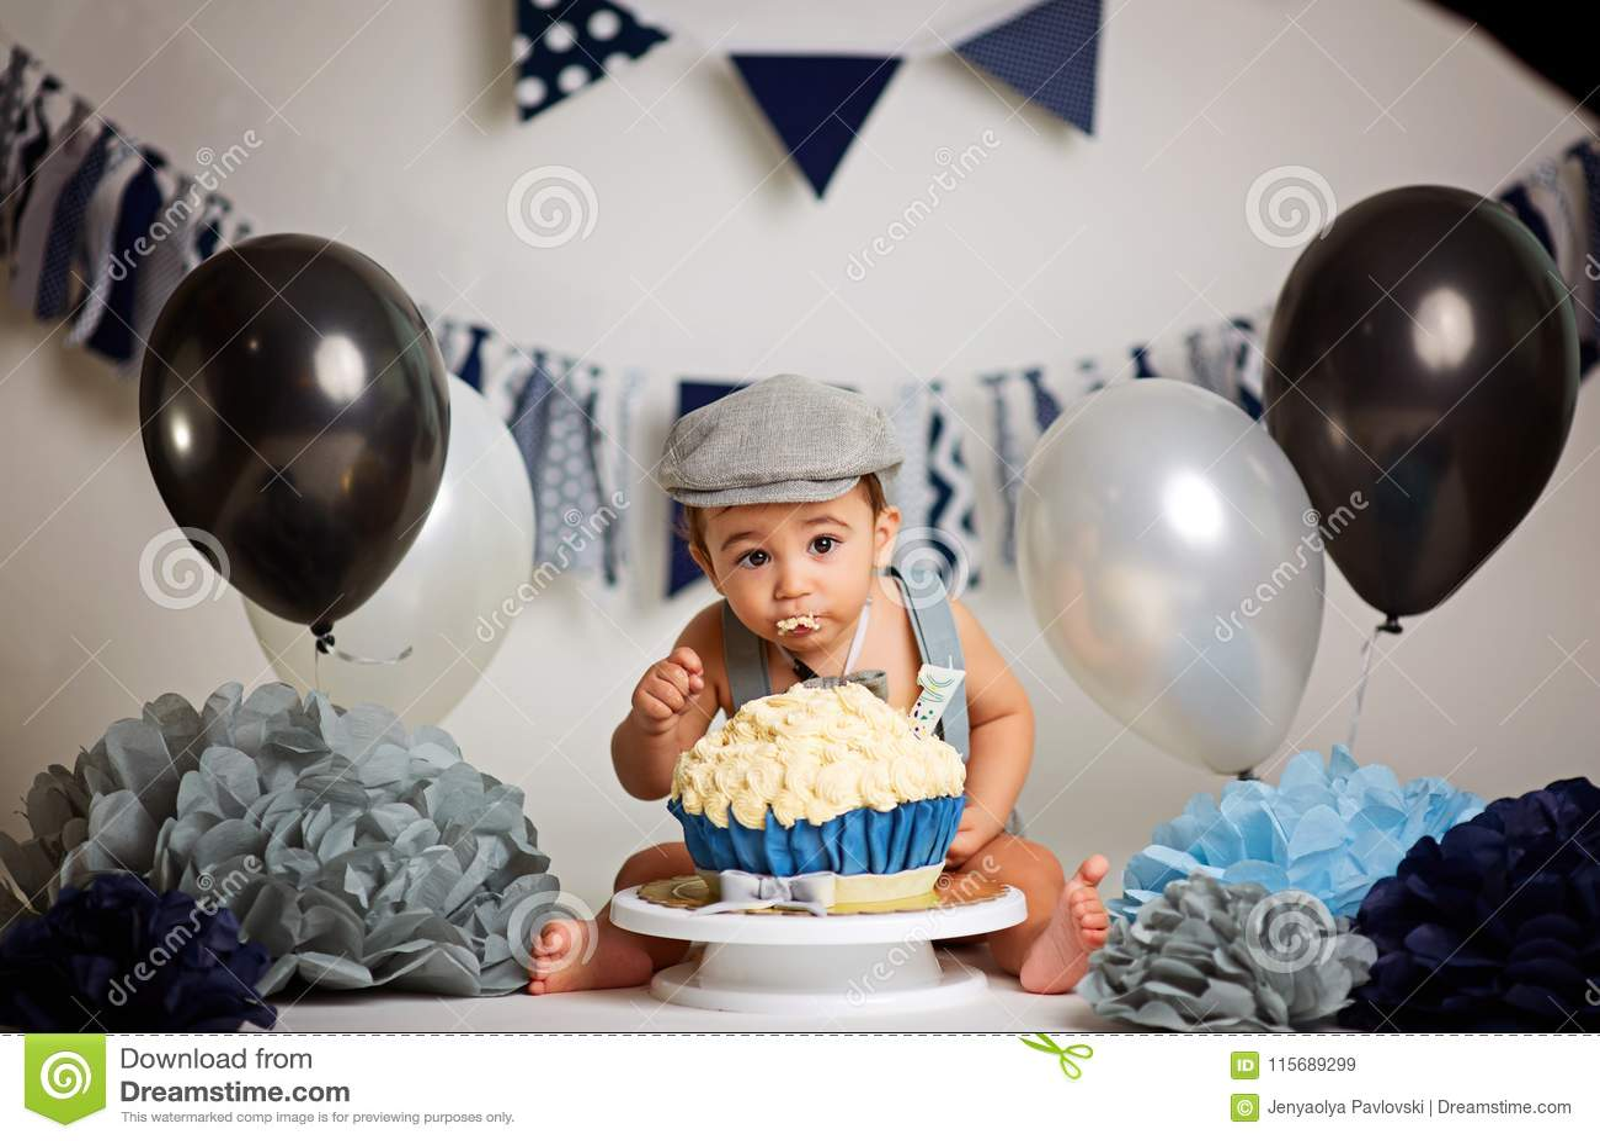 Infant Boys First Birthday Cake Smash Adorable Baby Smashing